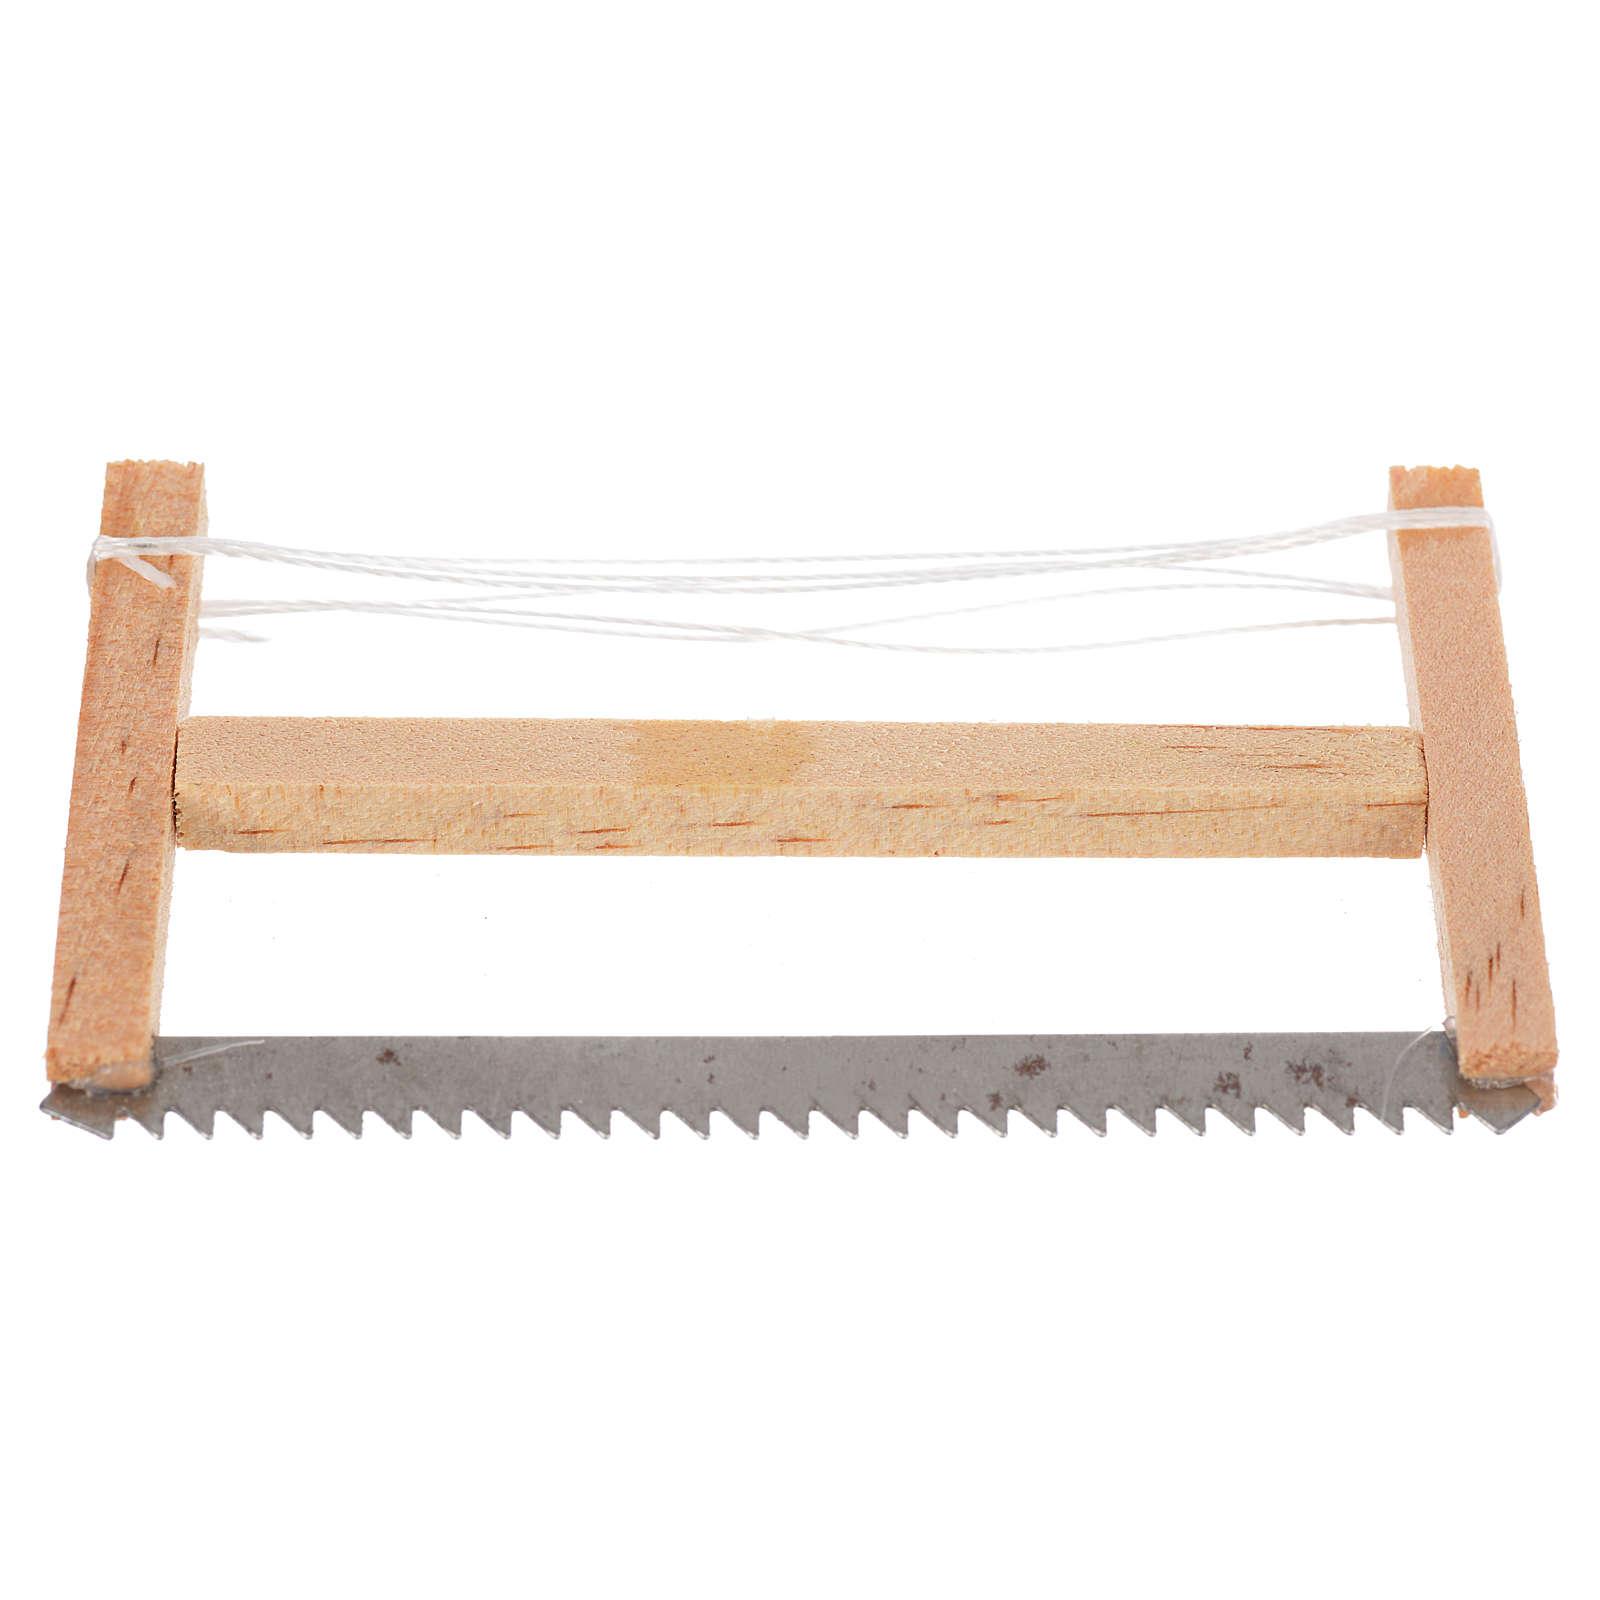 Woodcutter hacksaw, nativity accessory 6.5x4cm 4